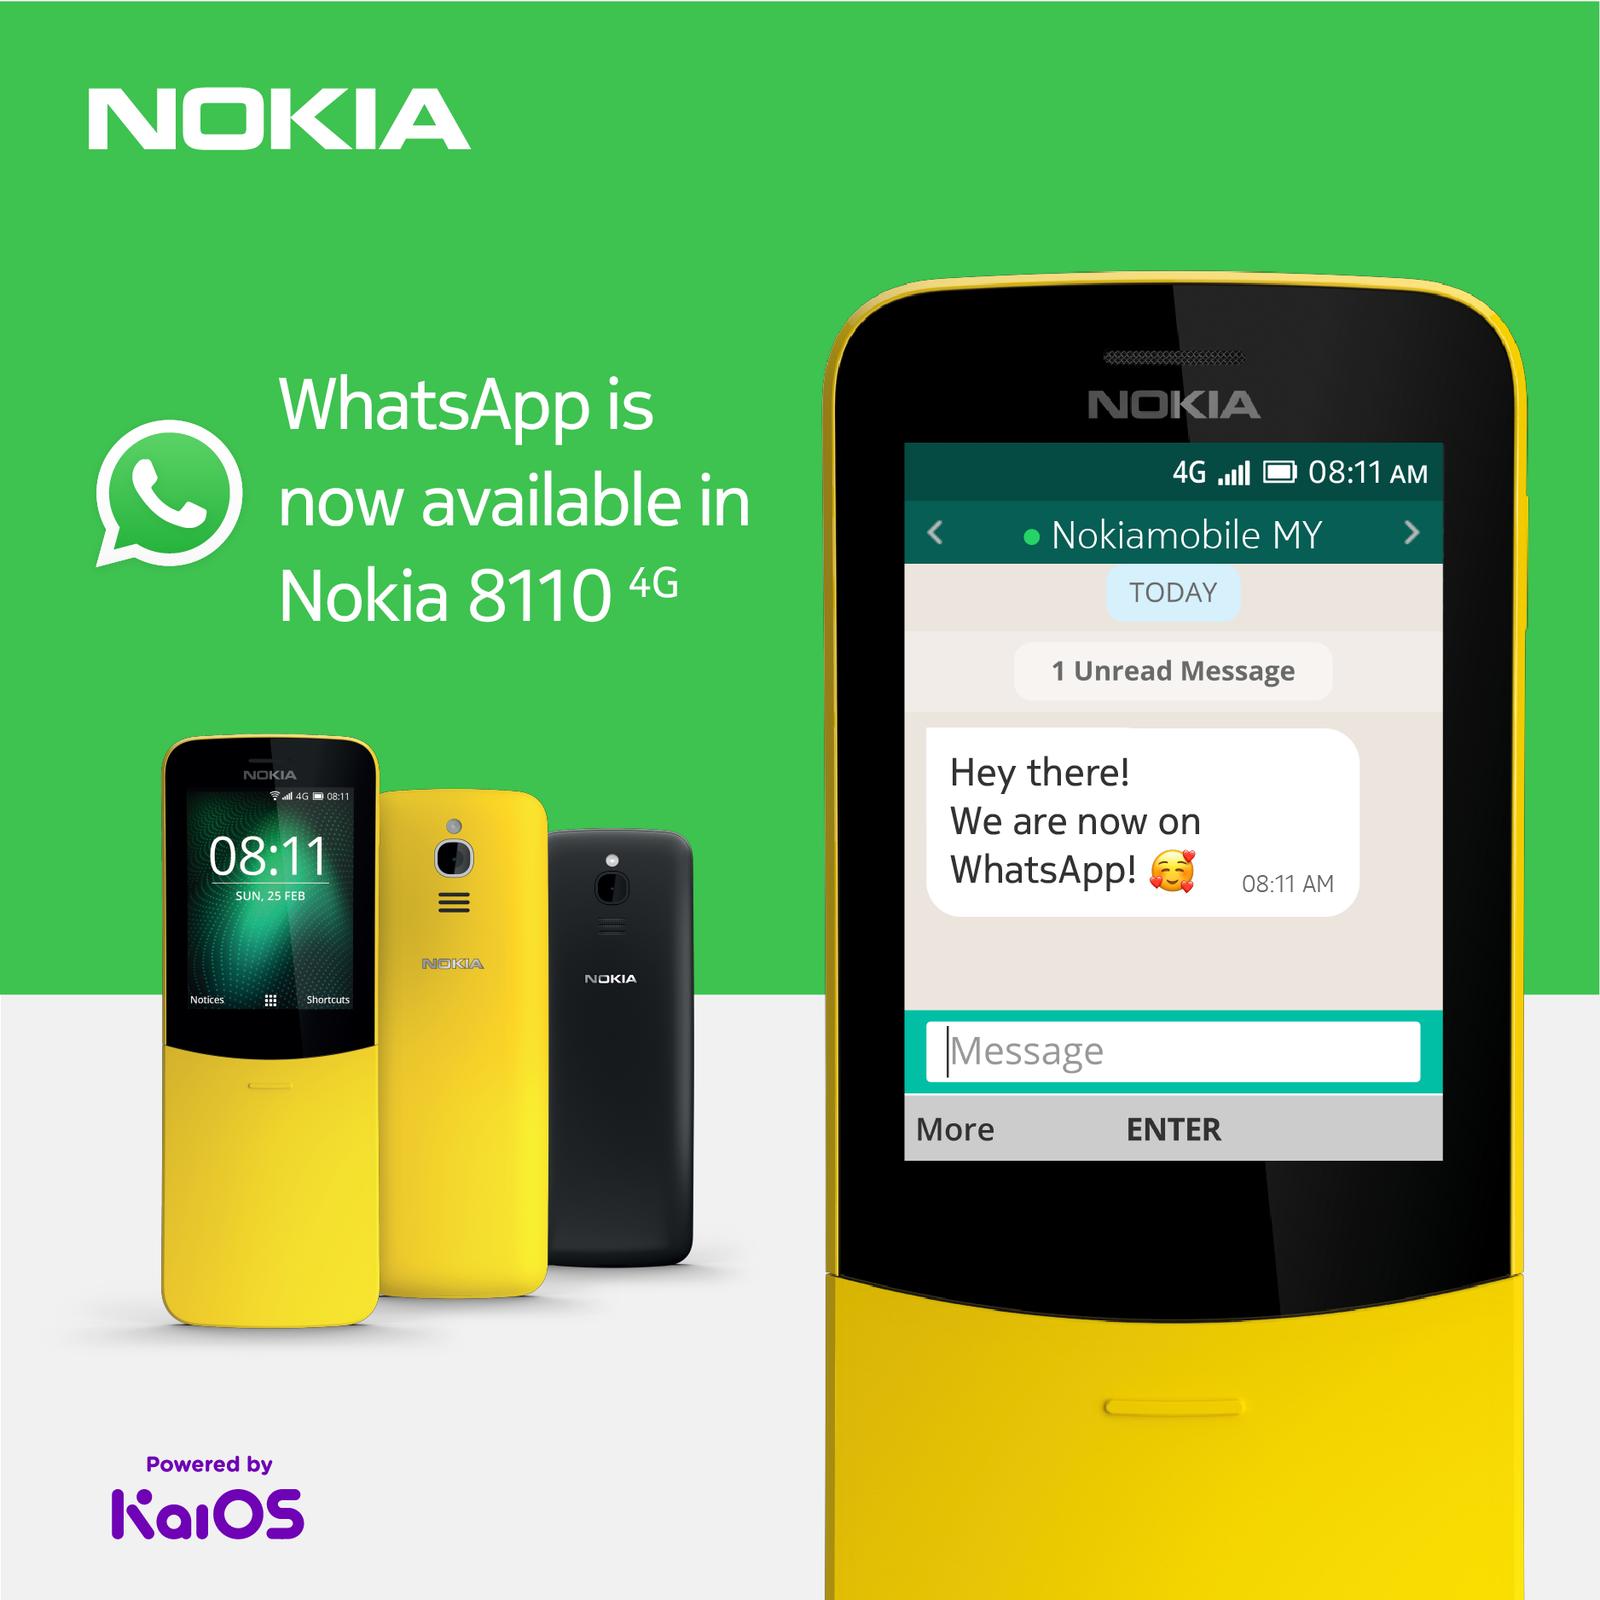 Nokia 8110 4g Whatsapp